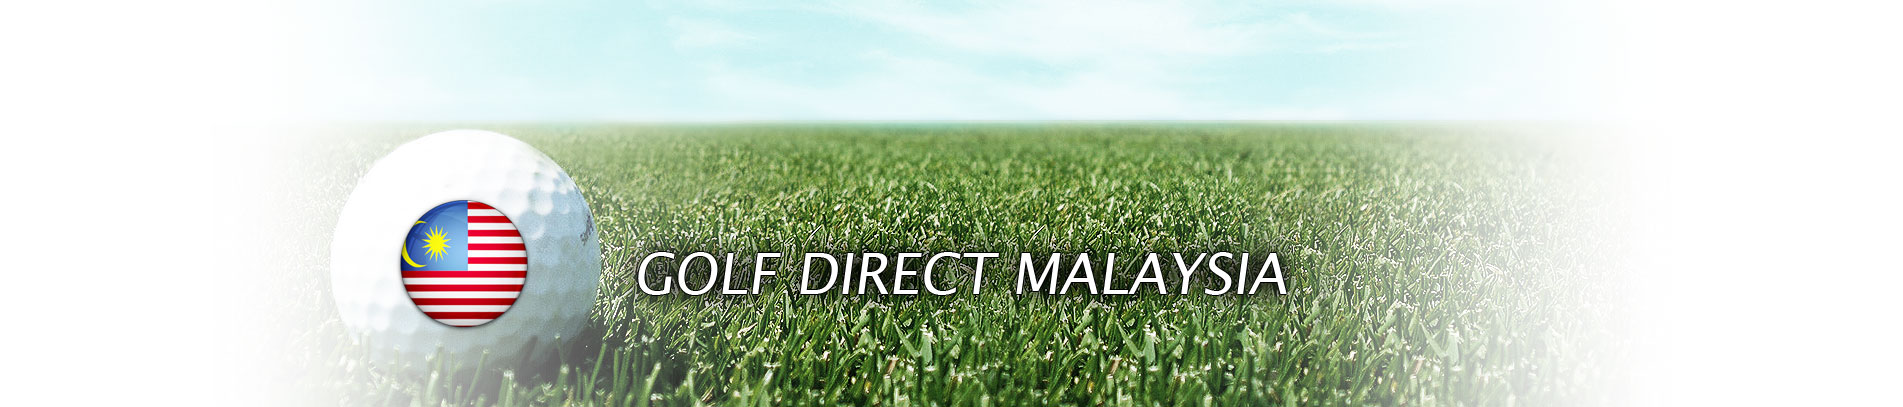 Golf Direct Malaysia